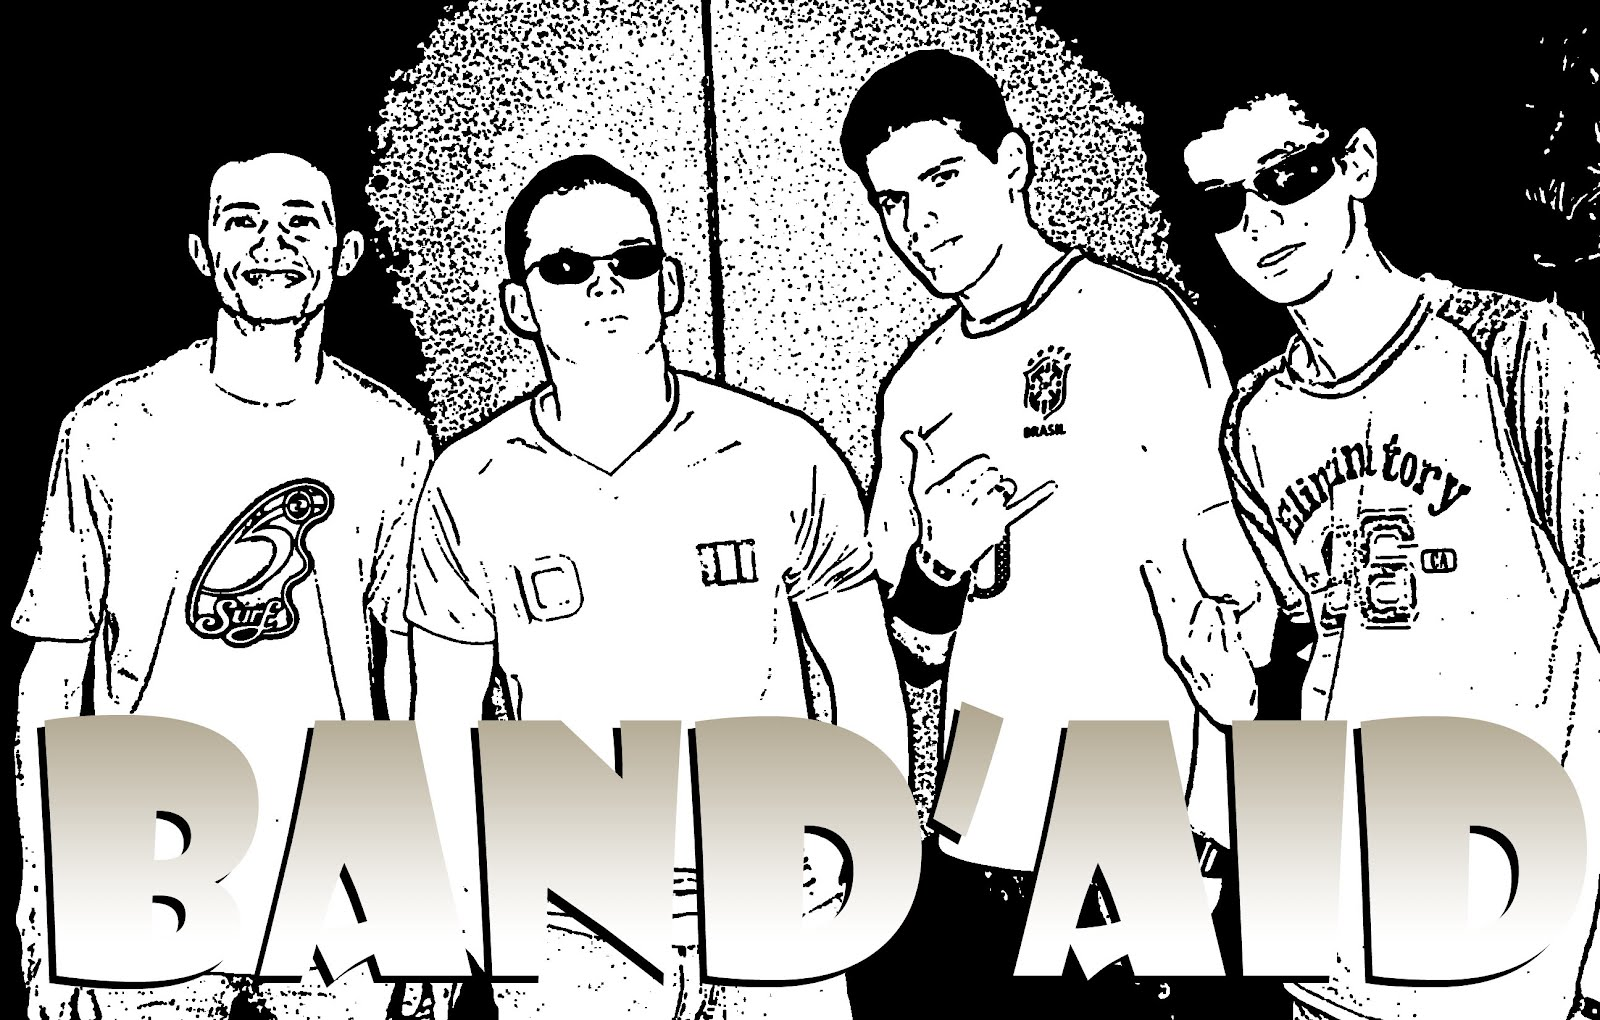 Band'aid